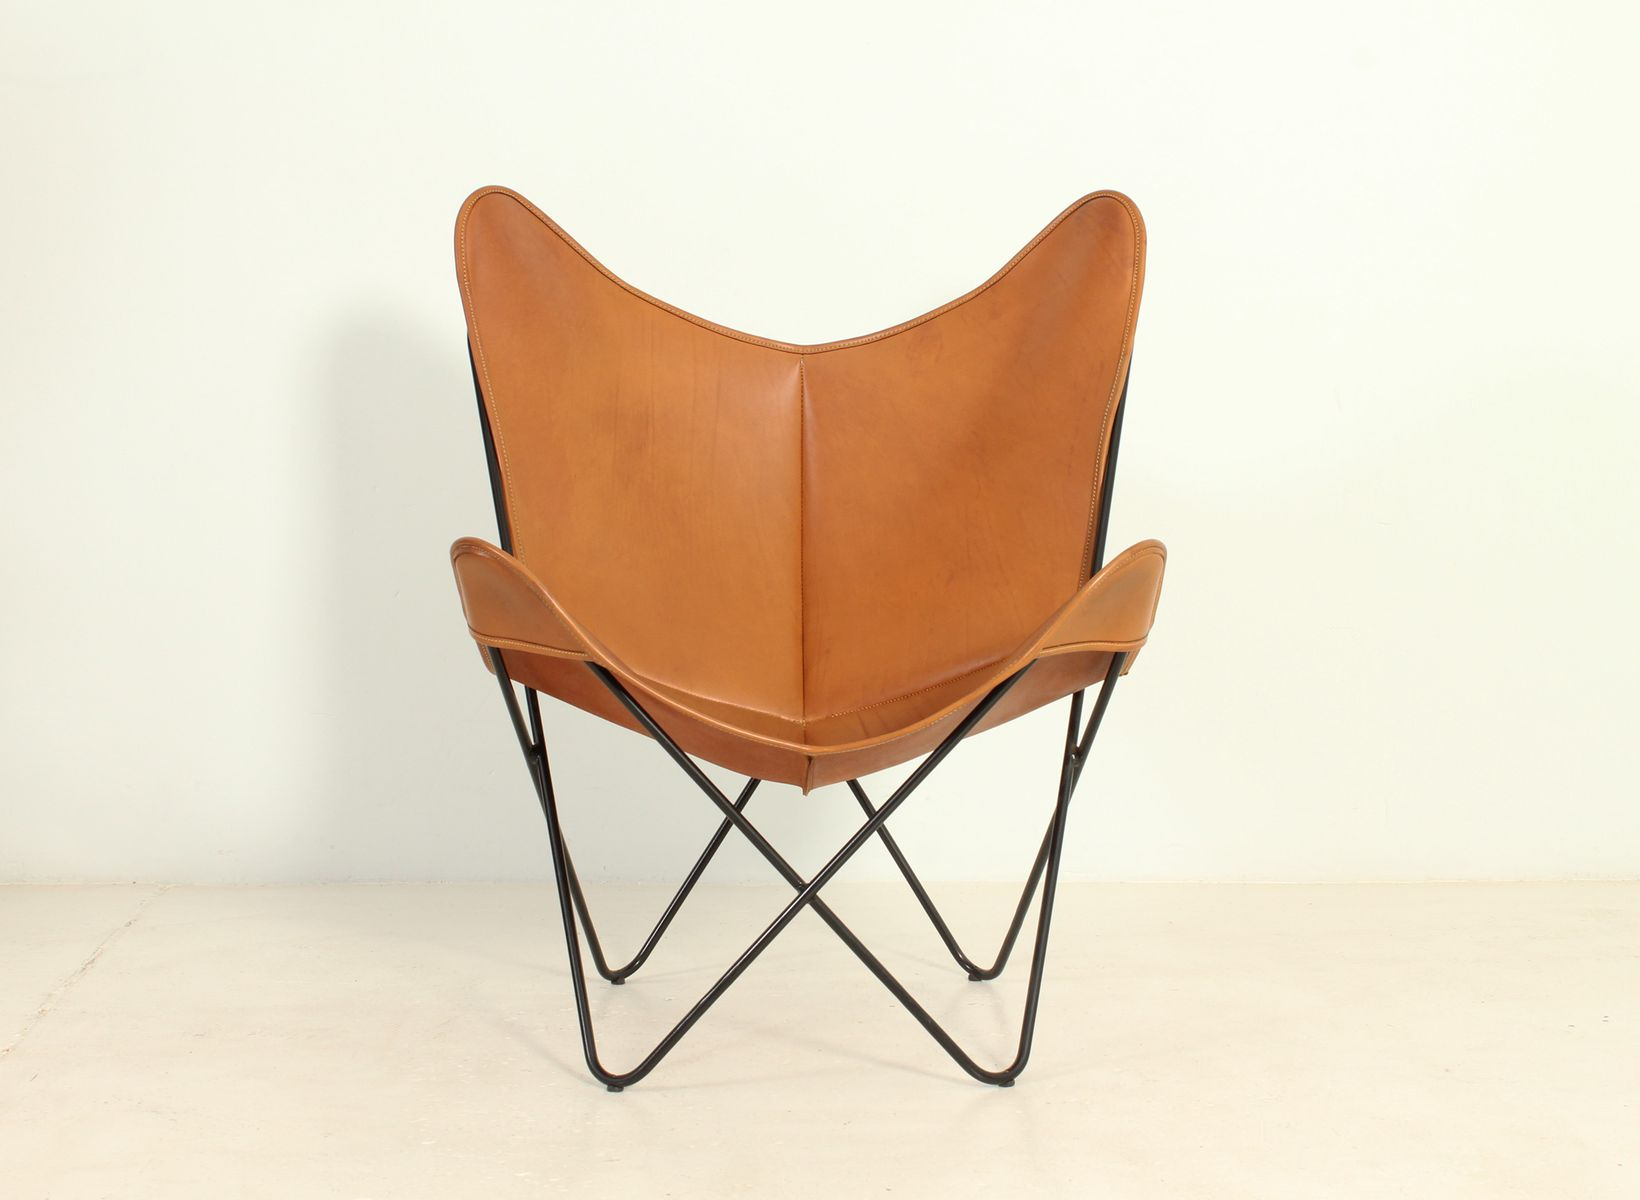 butterfly sessel von ferrari kurchan bonet 1970er bei pamono kaufen. Black Bedroom Furniture Sets. Home Design Ideas